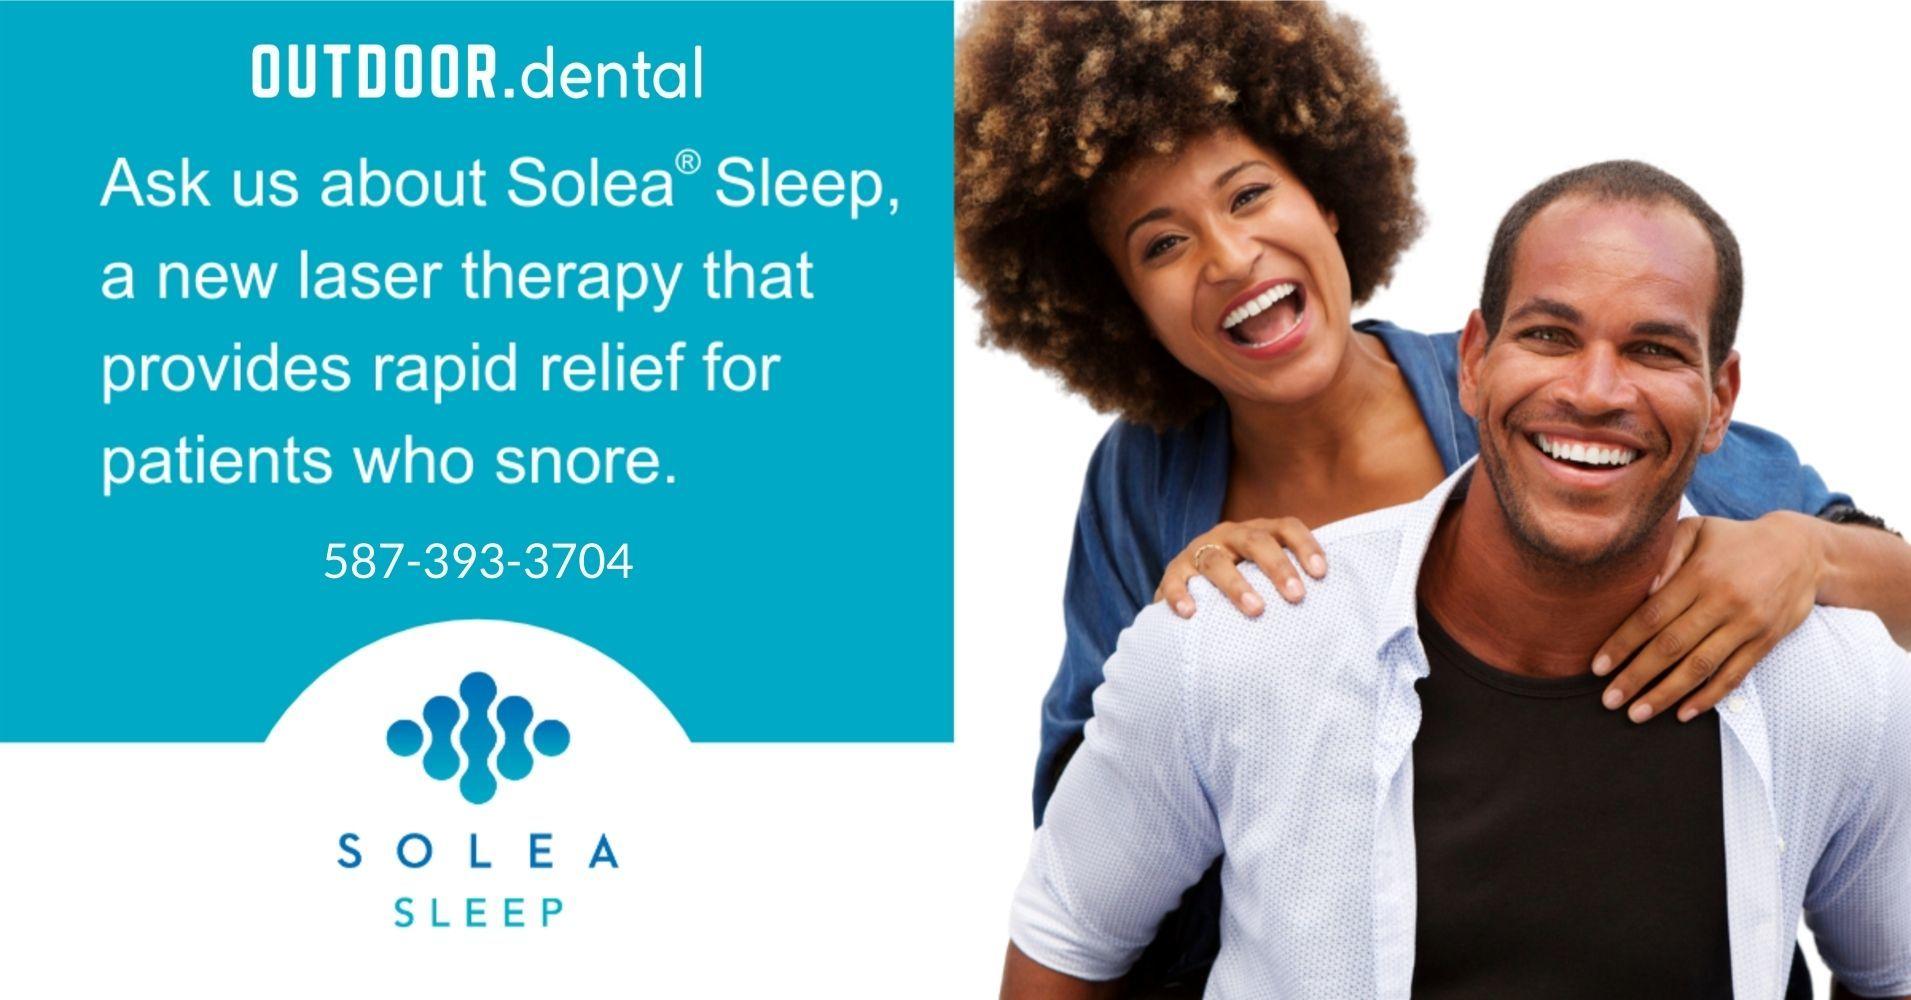 stop snoring, snoring treatment, anti snoring device, treatment for snoring, can snoring be cured, snoring remedies, snoring solutions